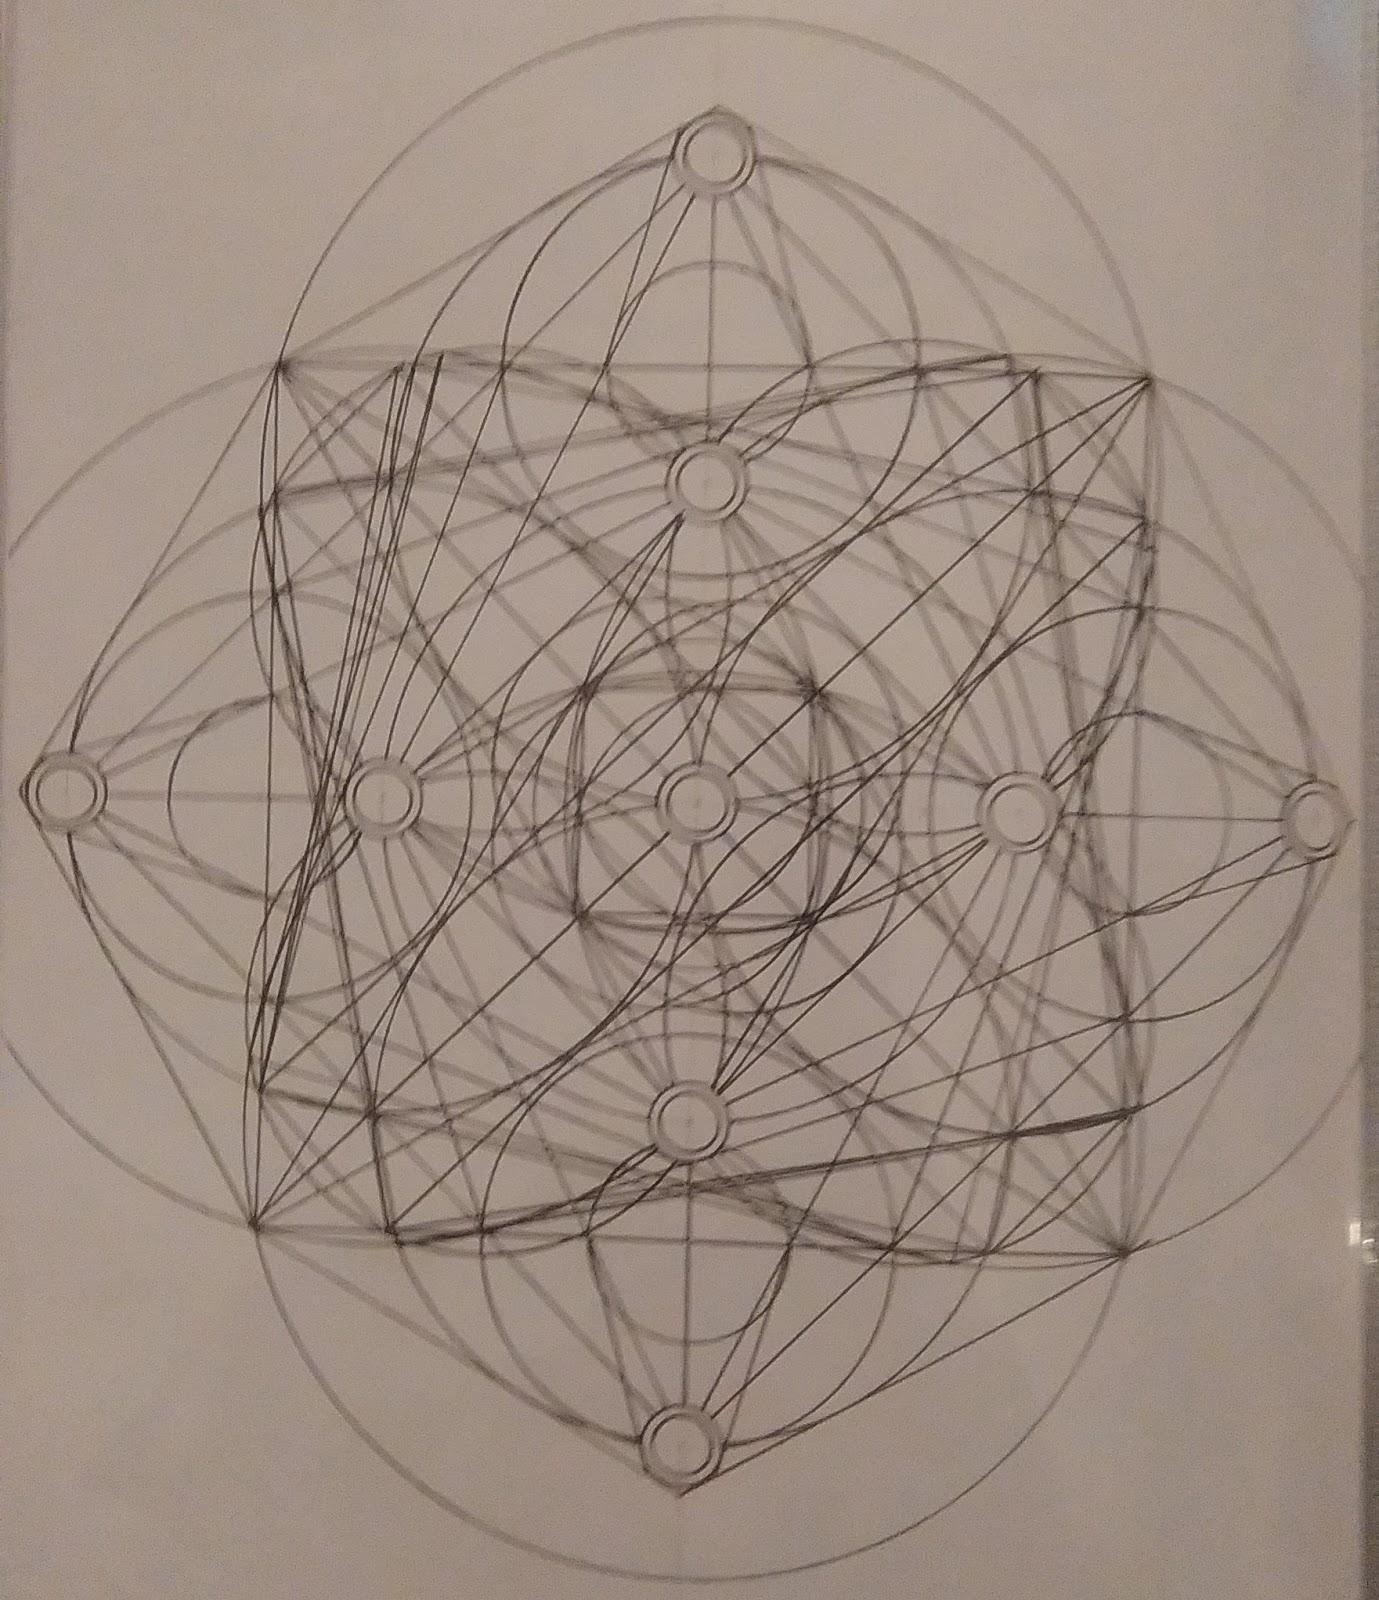 [SPOLYK] - Geometries & sketches - Page 6 48273046_1103195609867122_8306809282695790592_o